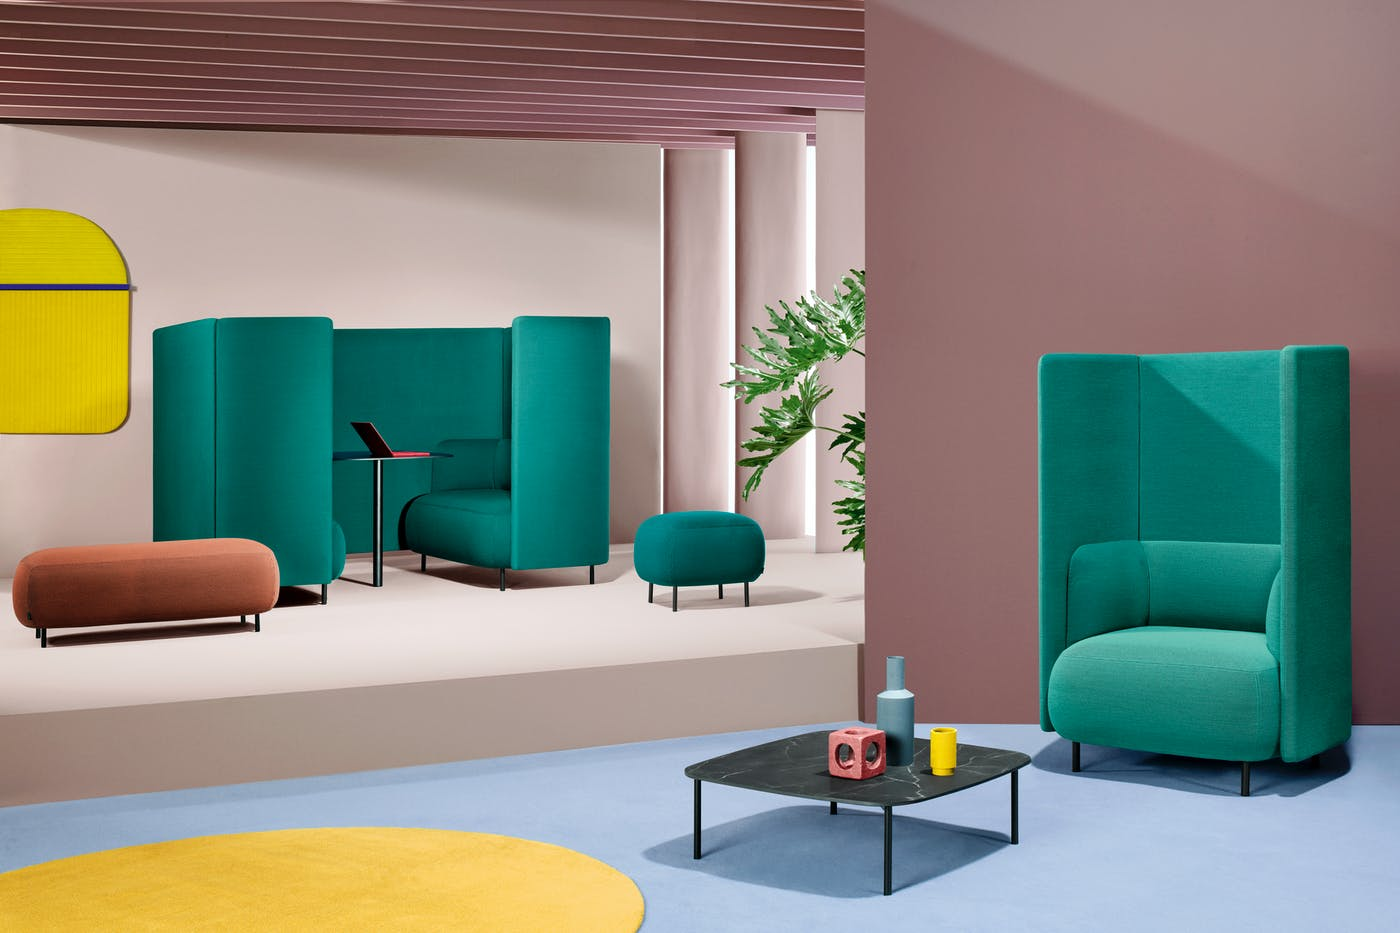 Pedrali Buddyhub designed by Busetti Garuti Redaelli art direction Studio FM photo Andrea Garuti 1